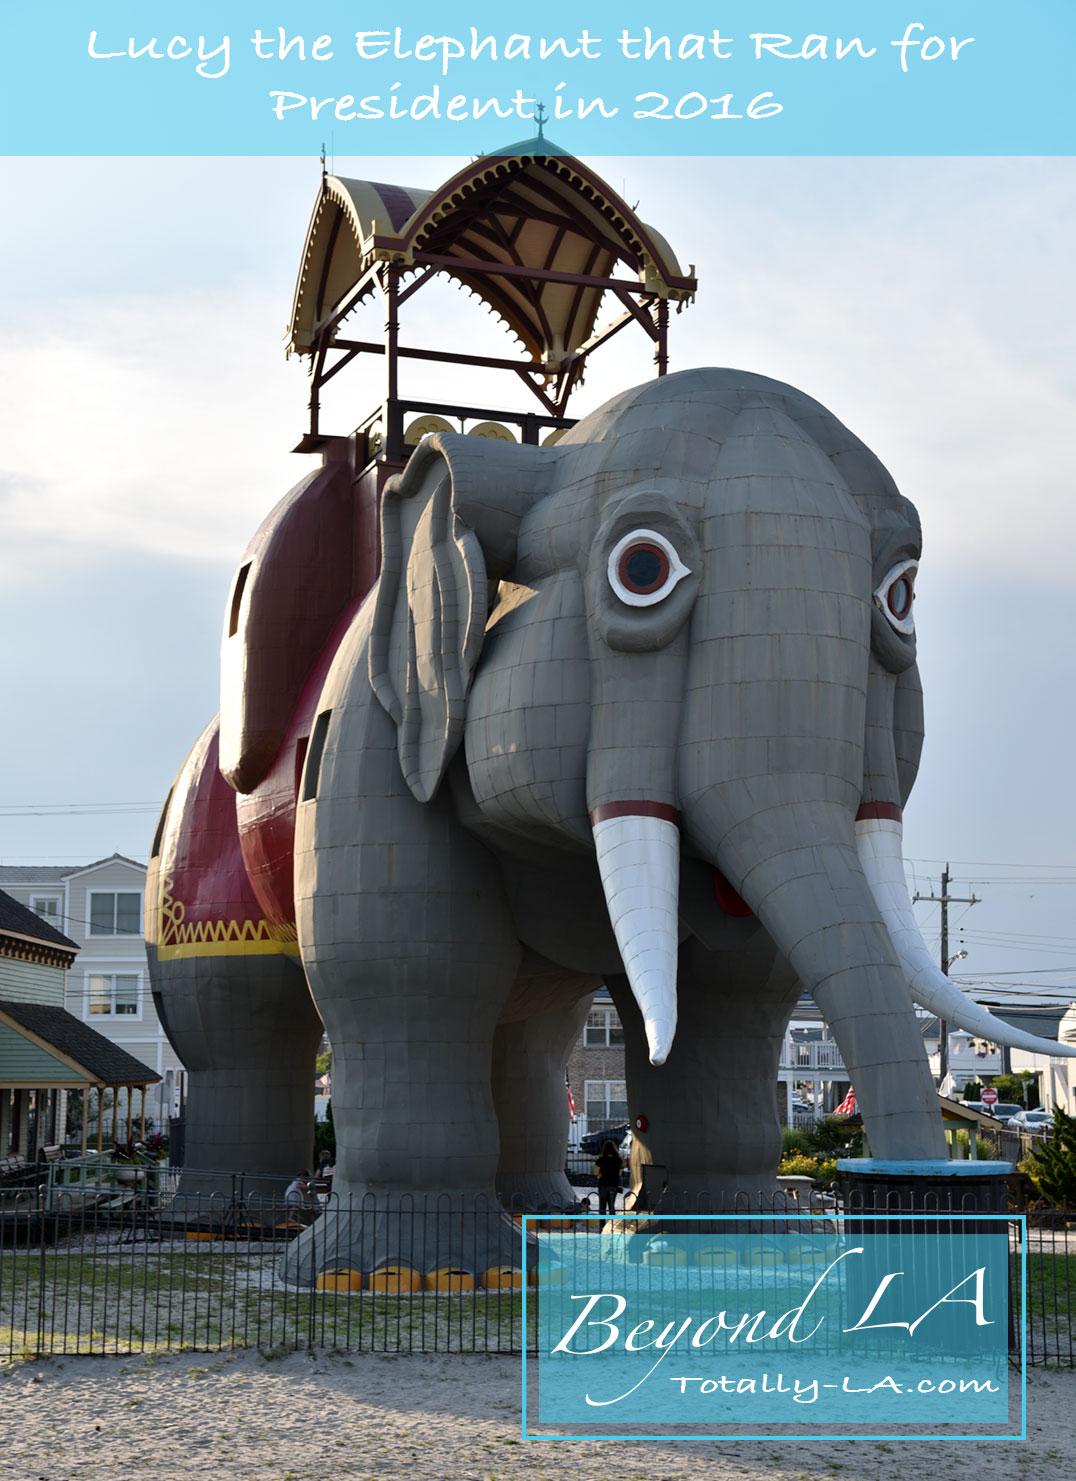 Lucy elephant